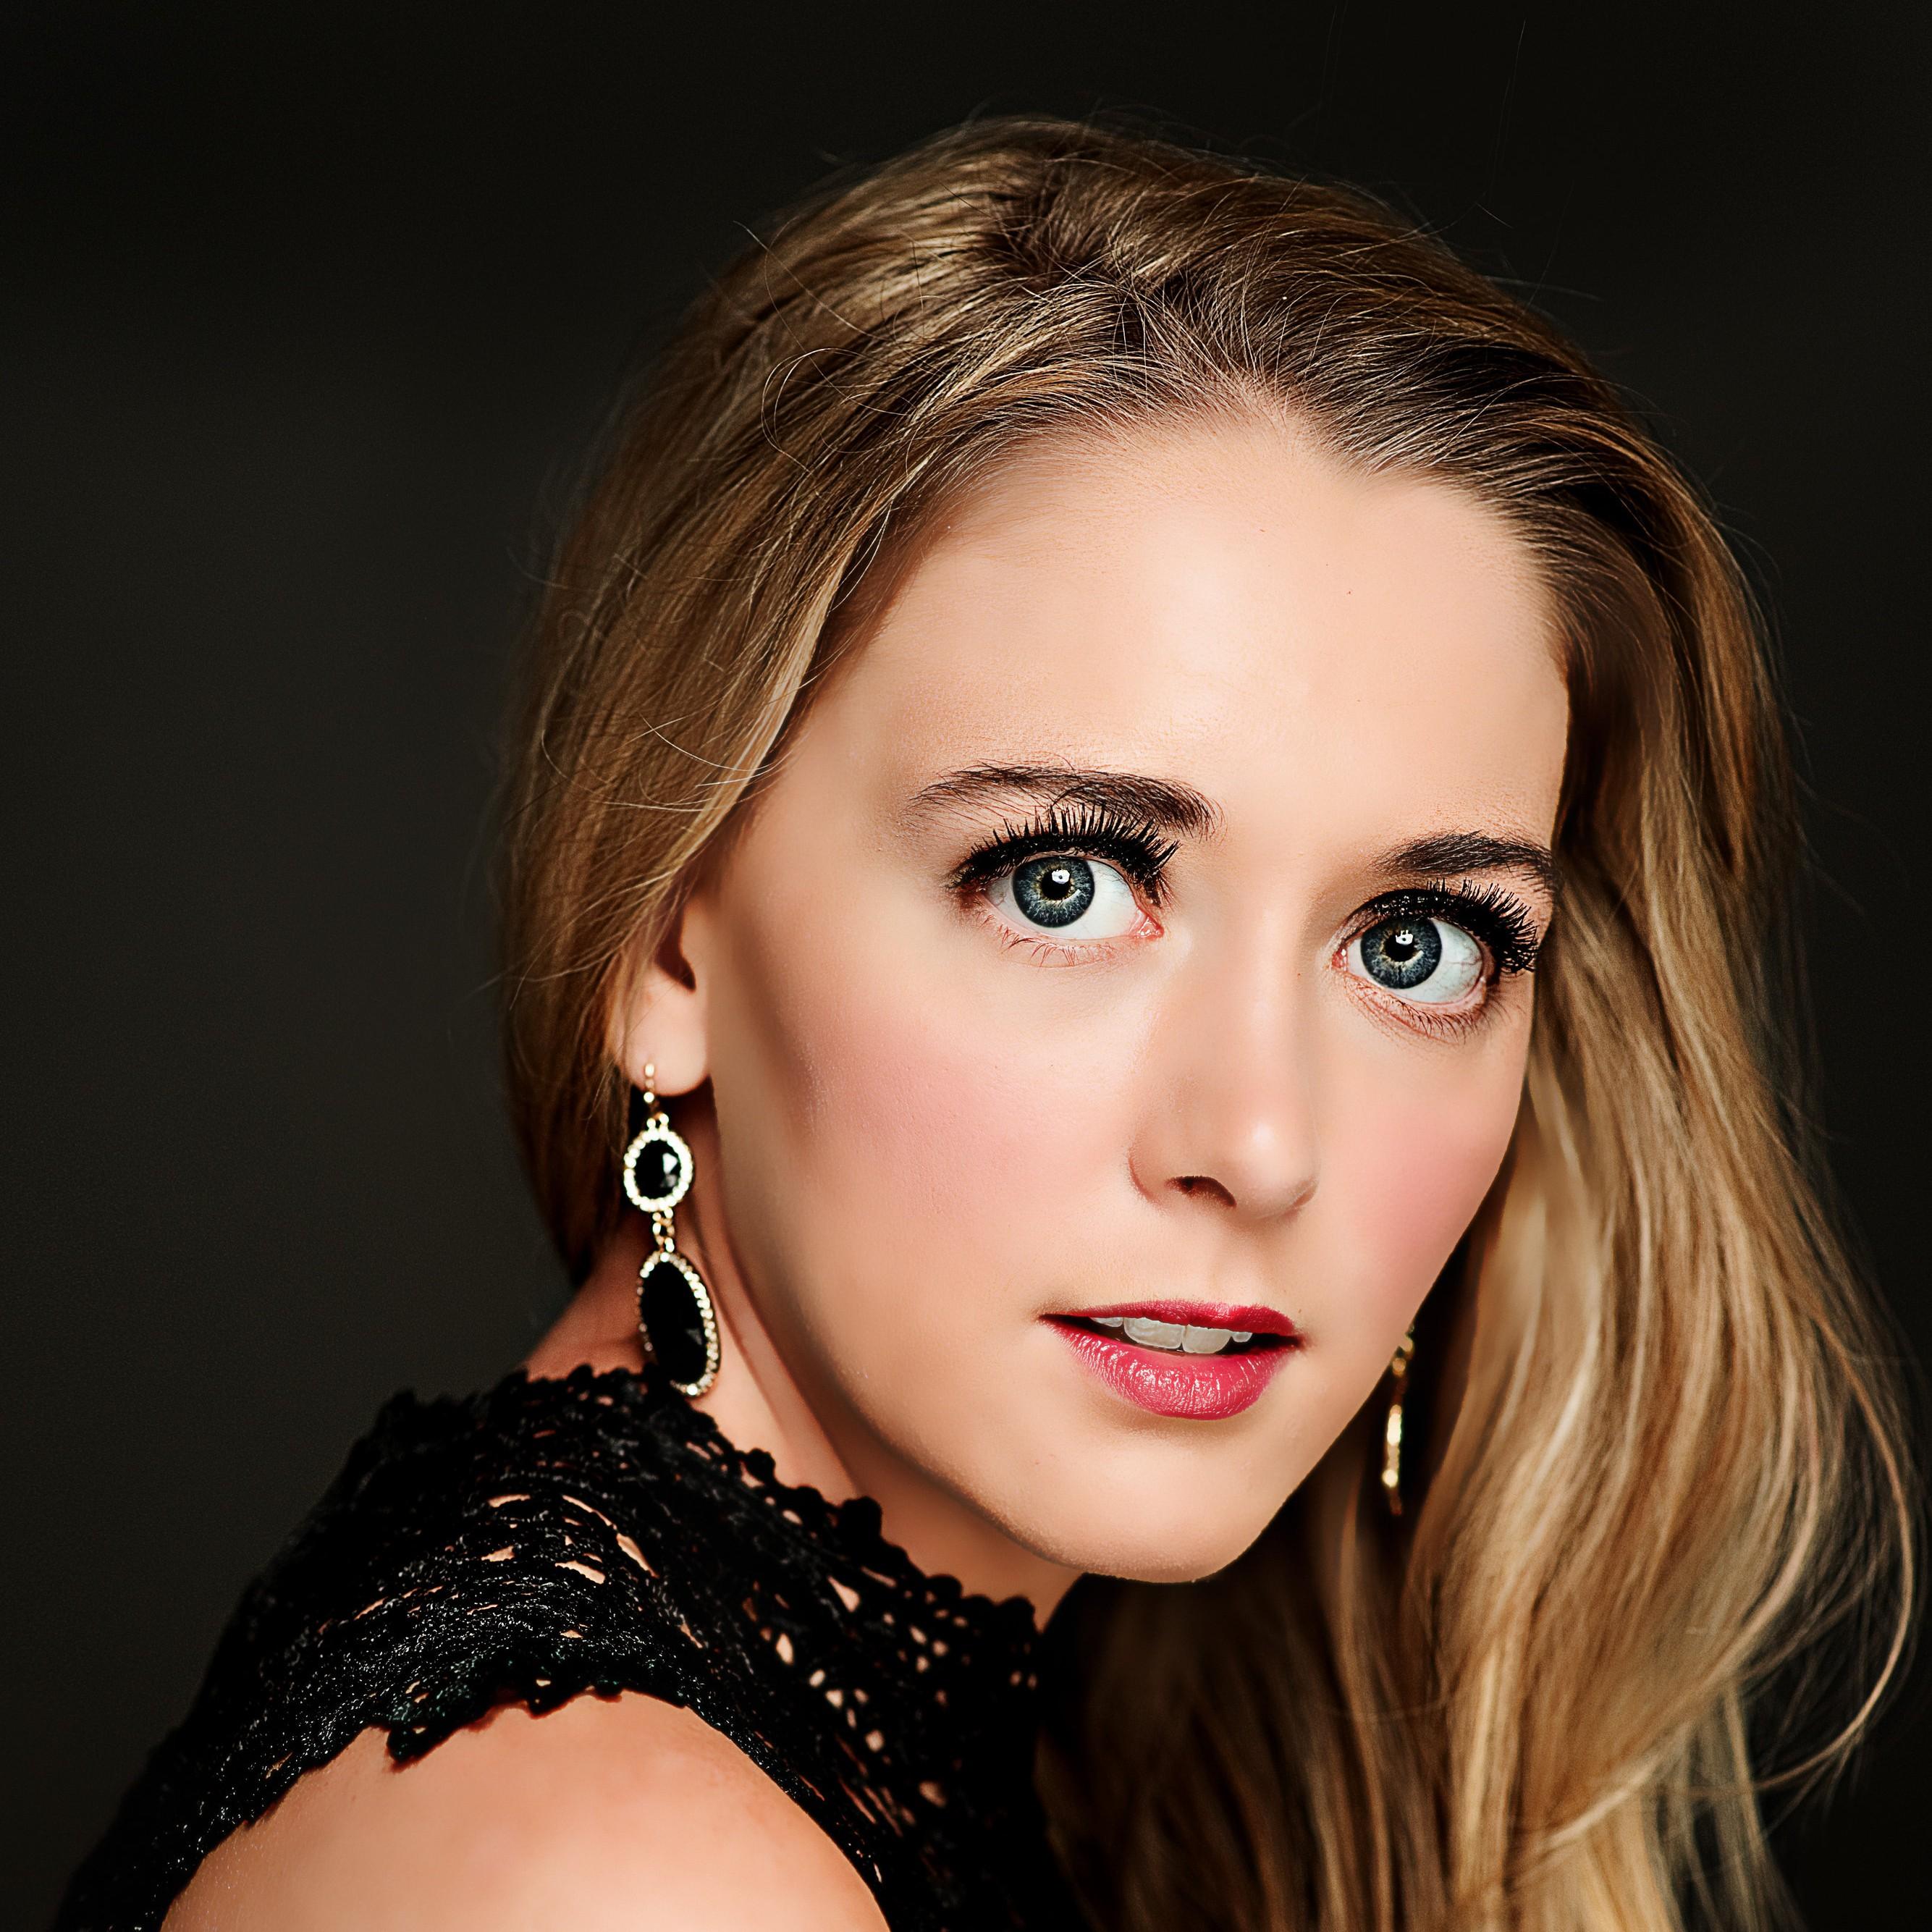 Victoria Kroencke